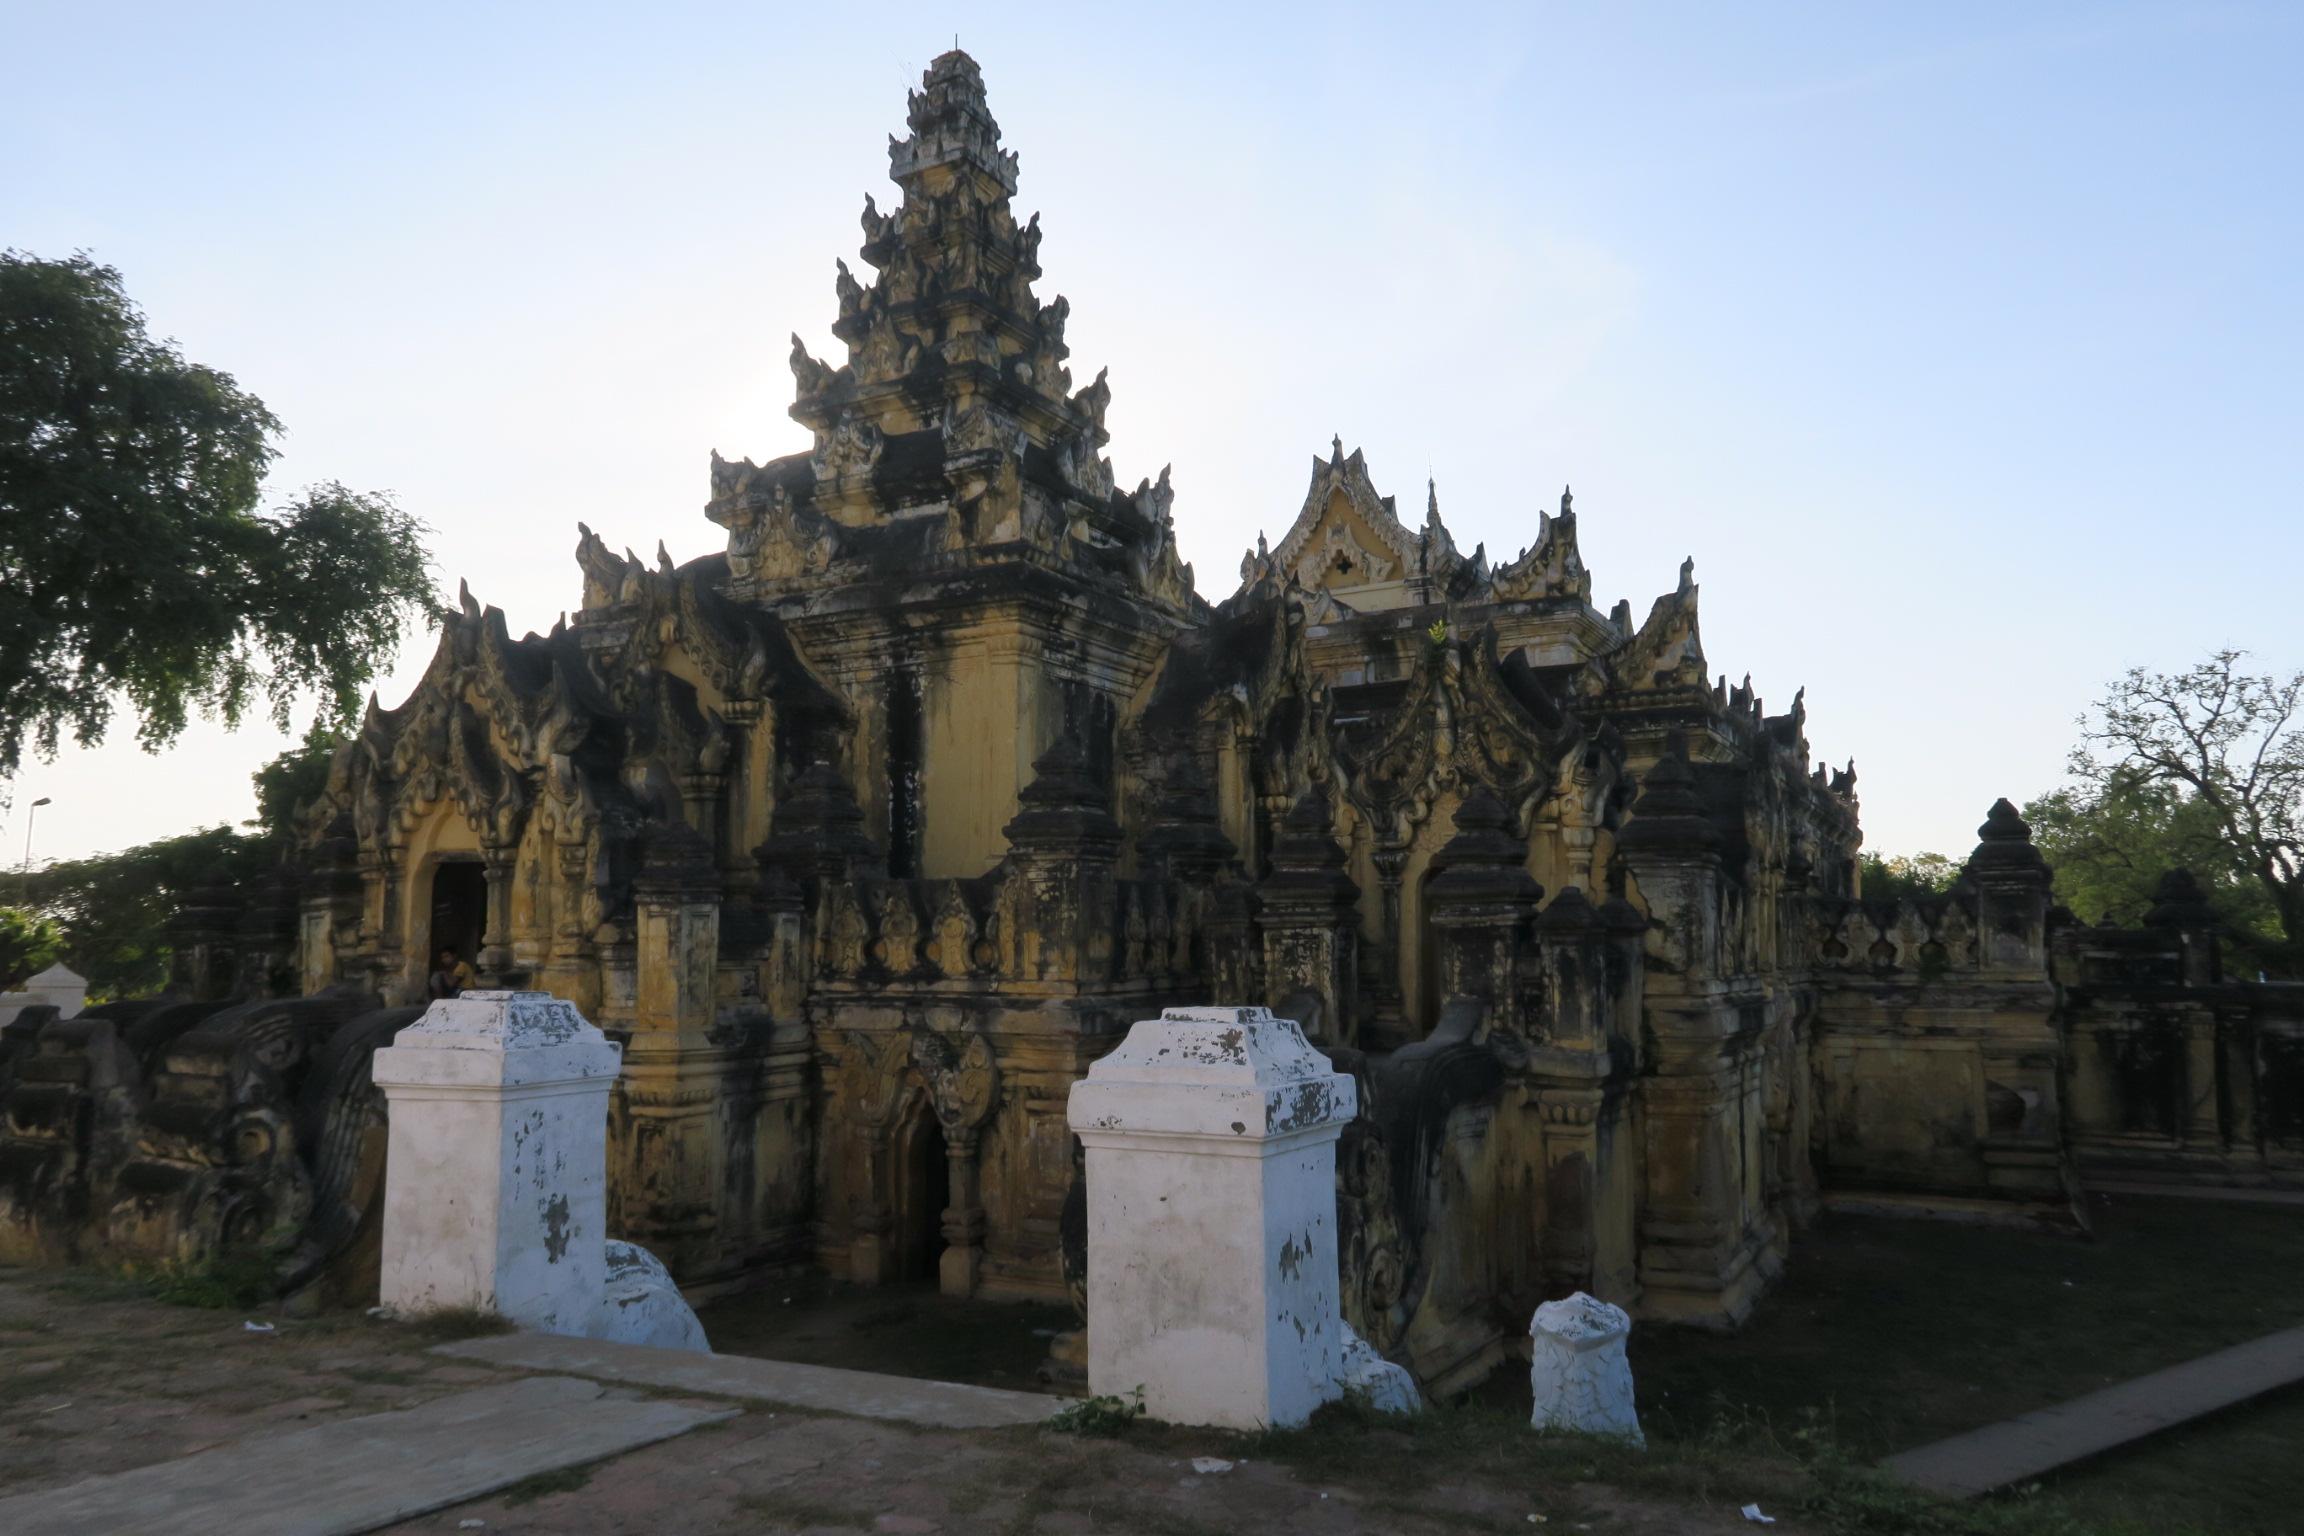 Yadana Hsemee Pagodas